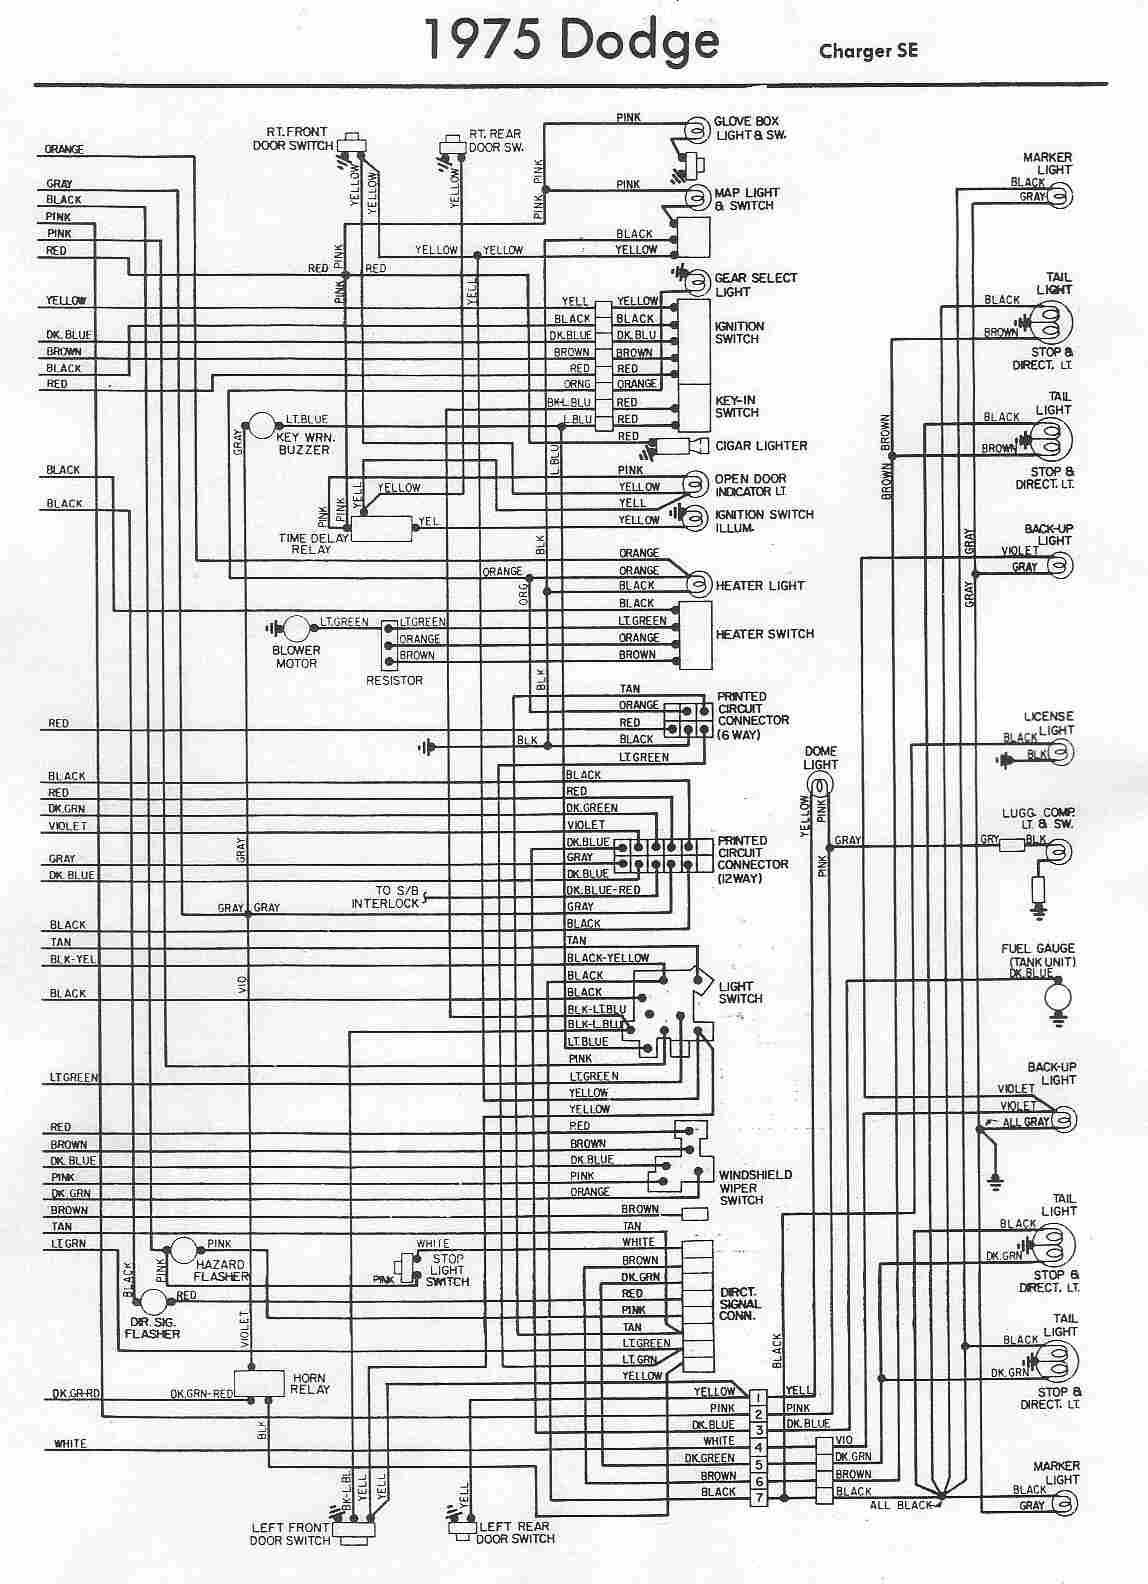 Dodge Challenger Wiring Diagram Data Mustang Gauge Additionally 1970 Temperature Dash Furthermore 72 Fuel Tank 1972